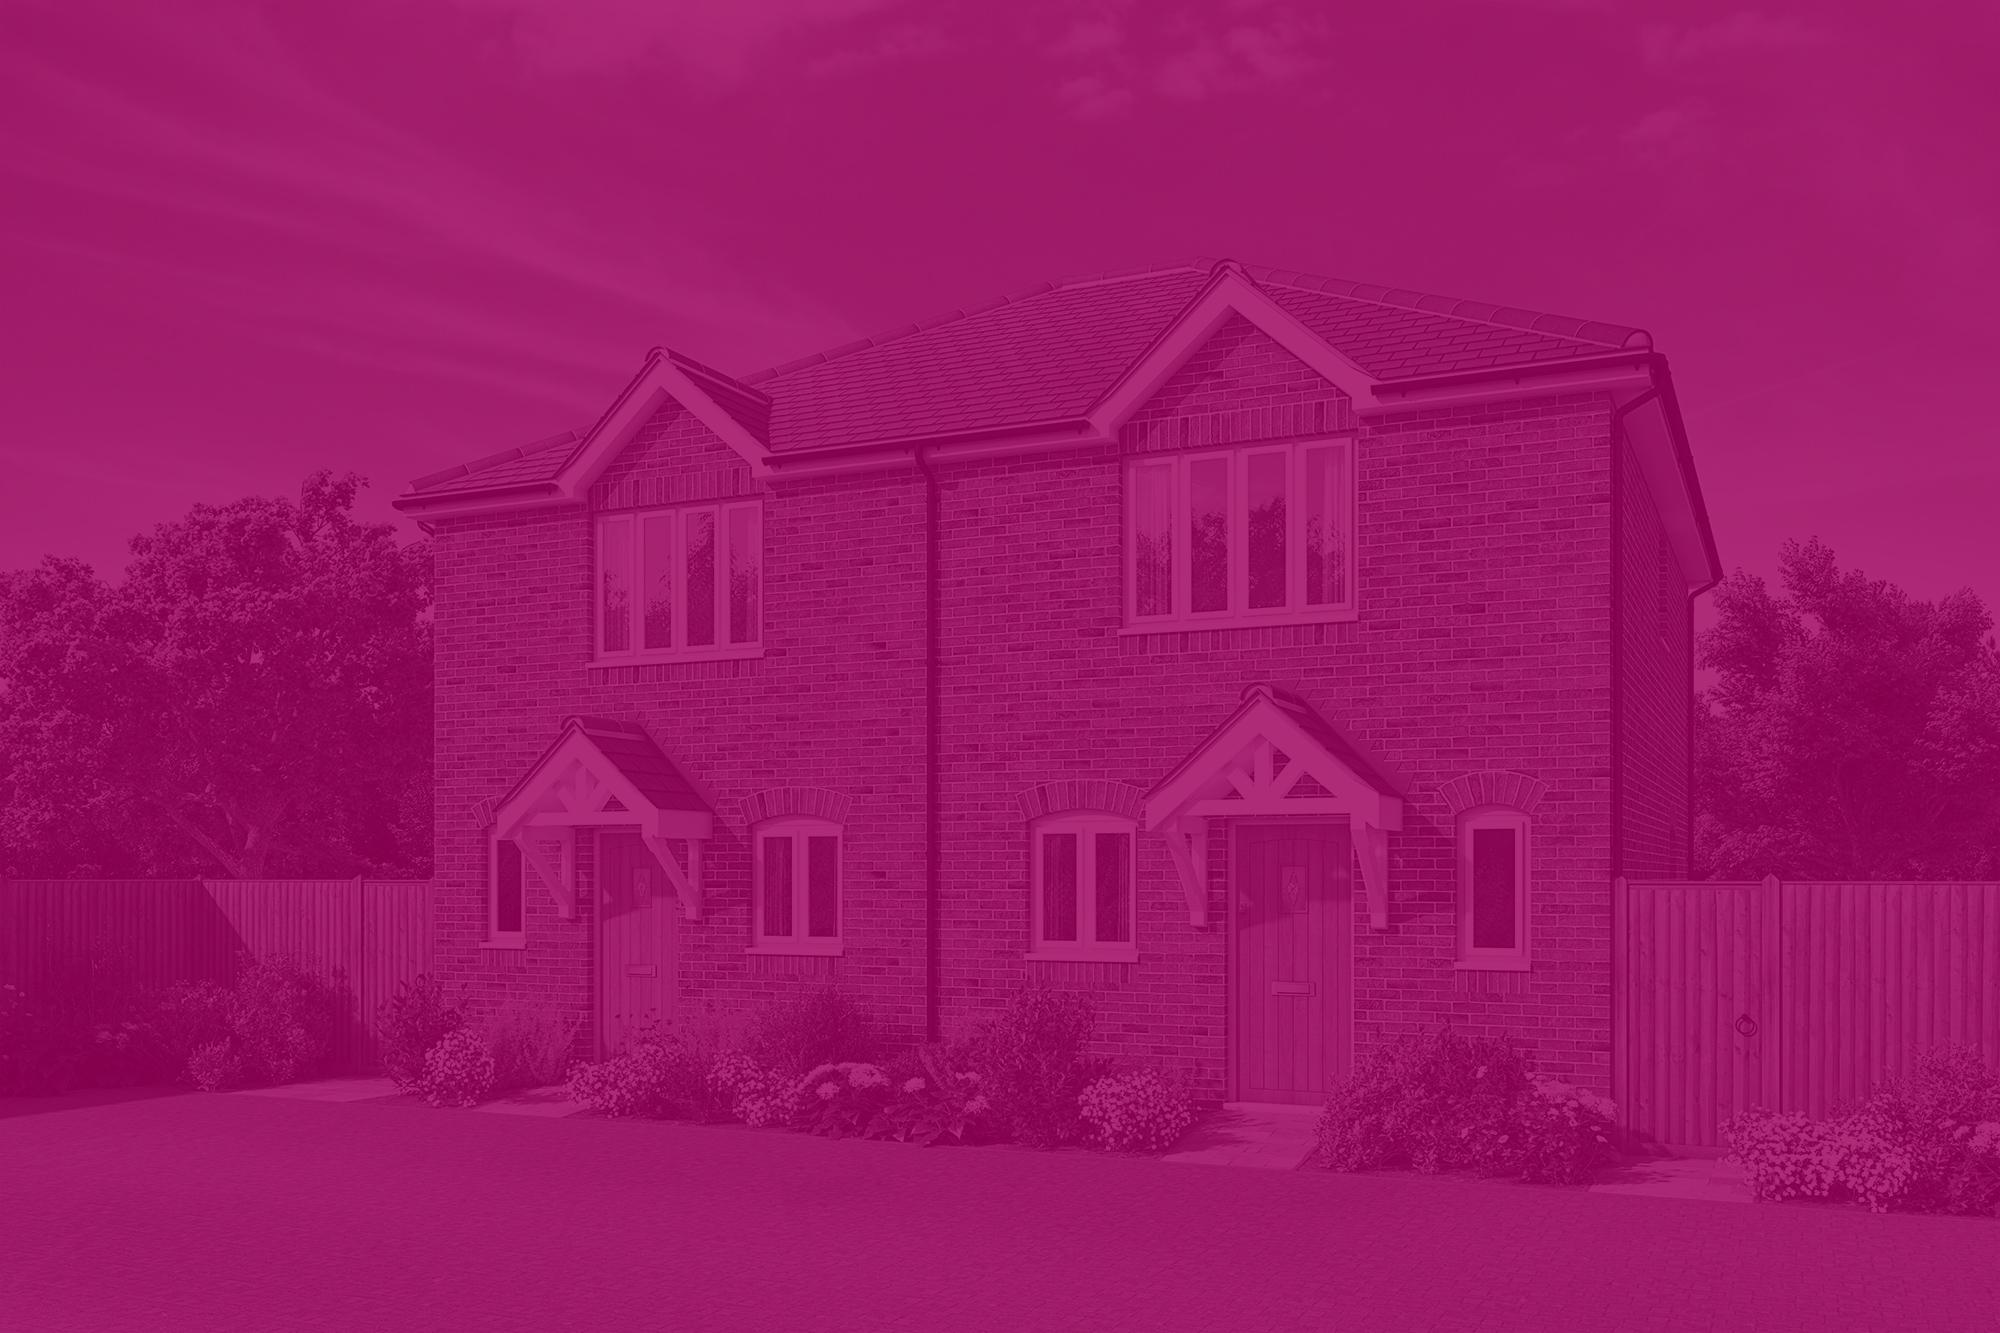 Bowtree Homes